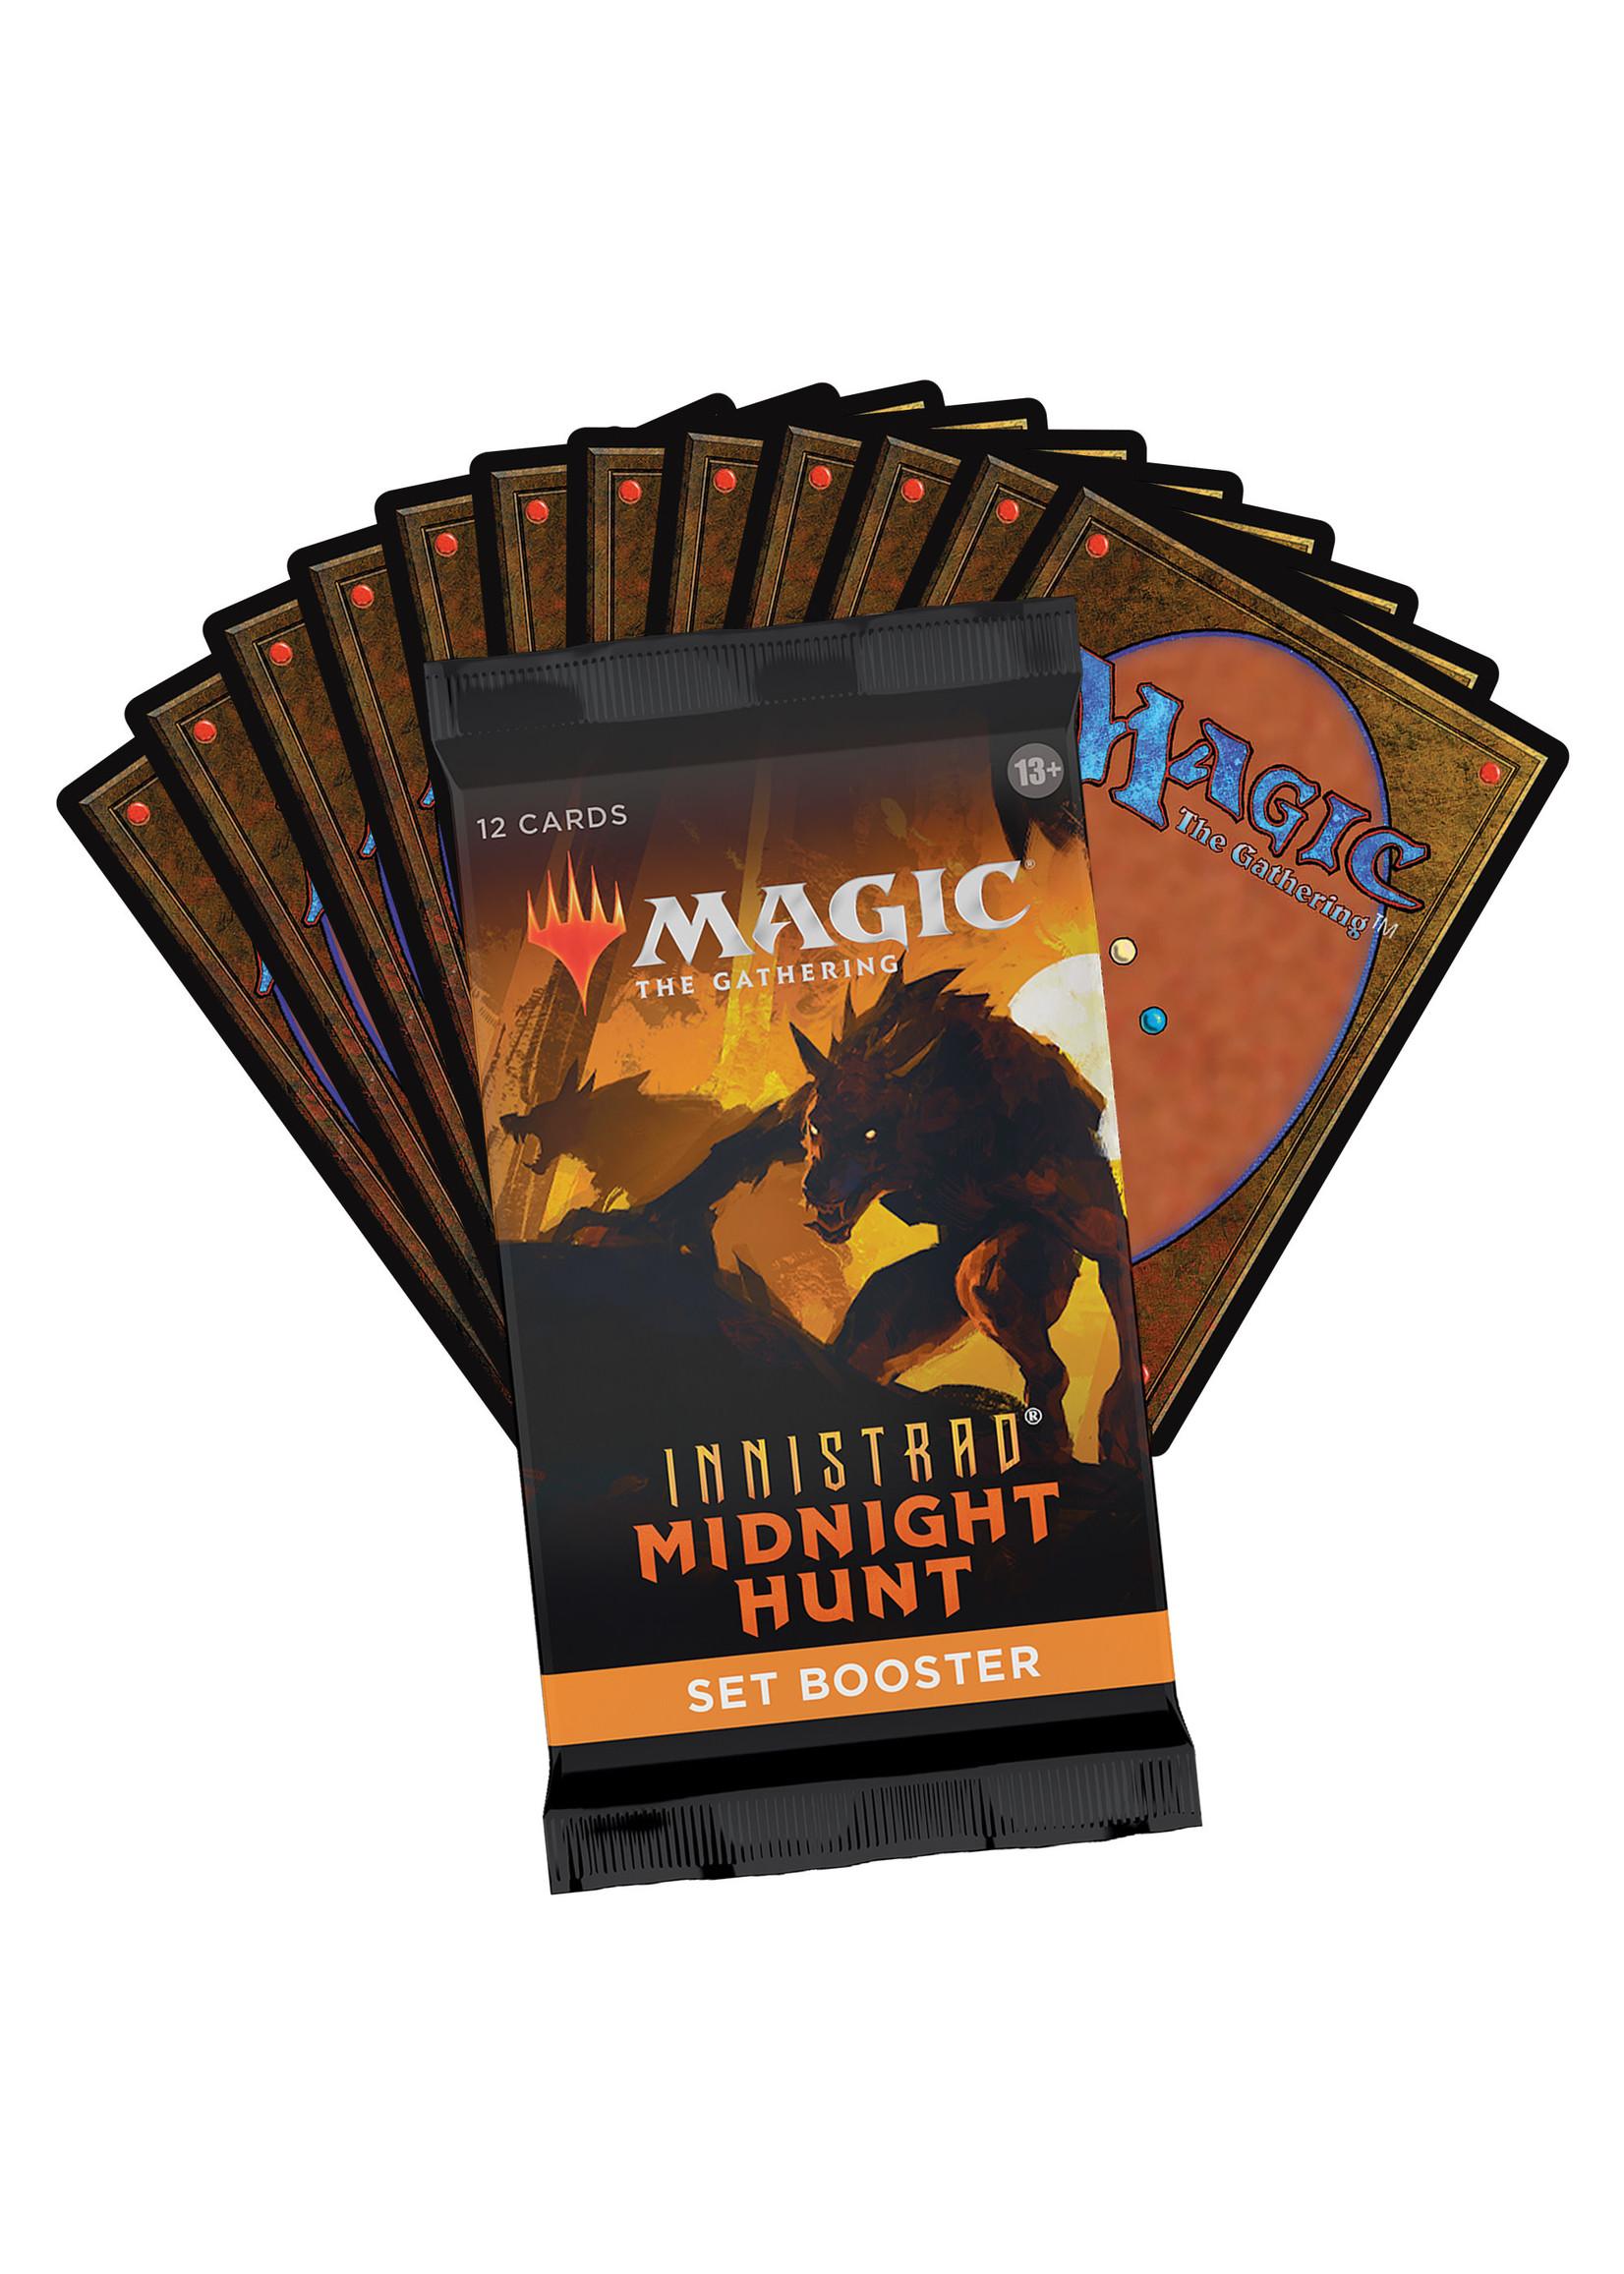 Magic: The Gathering Innistrad Midnight Hunt Set Booster Box (30)